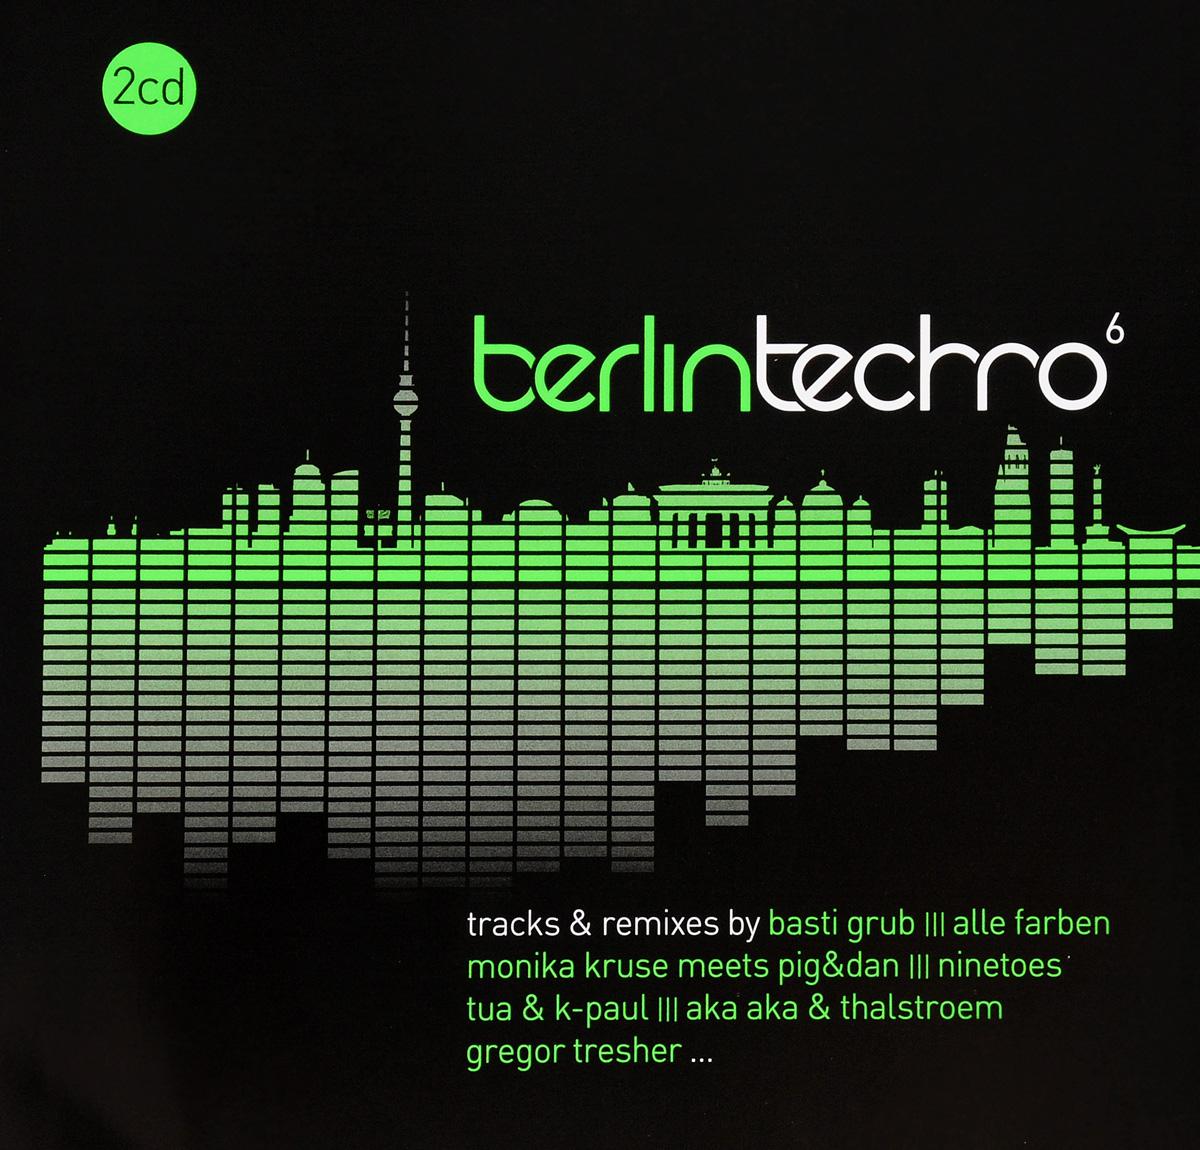 Berlin Techno 6 (2 CD) thalstroem мишель клейс toto la momposina sierra sam моника крузе telefon tel aviv makit namito berlin techno